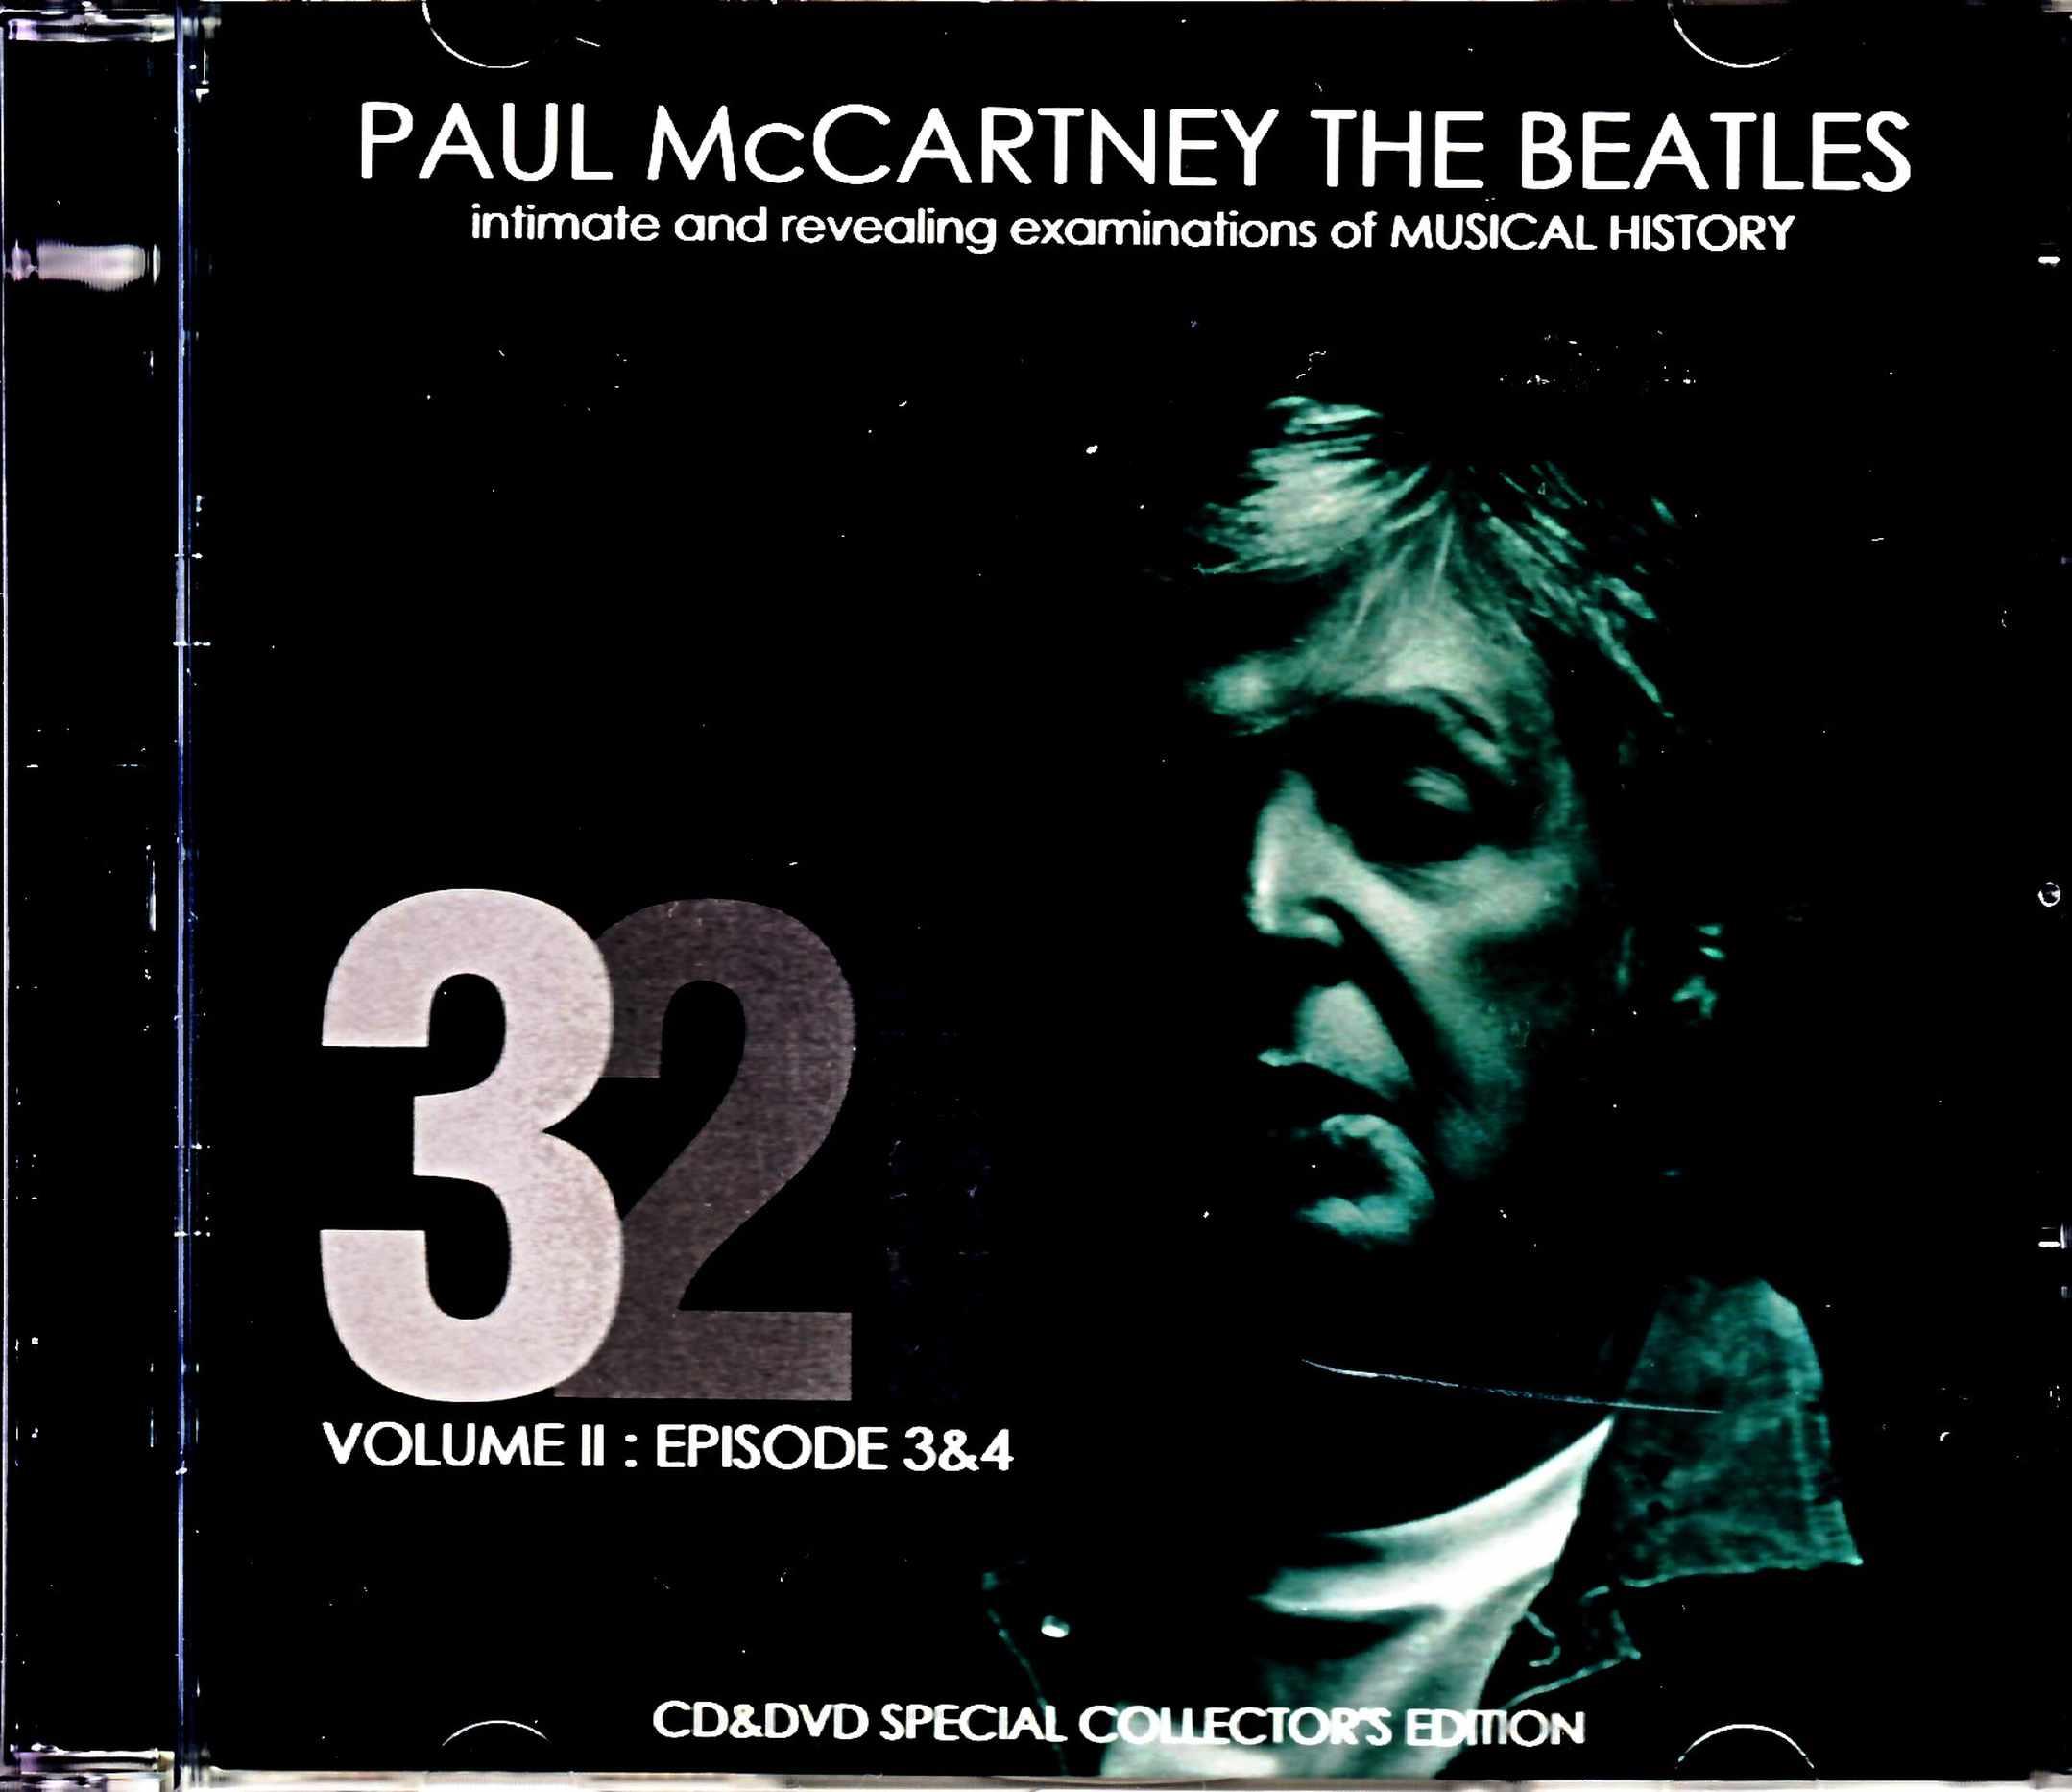 Paul McCartney Beatles ポール・マッカートニー ビートルズ/321 Intimate and Revealing of Music History Vol.2